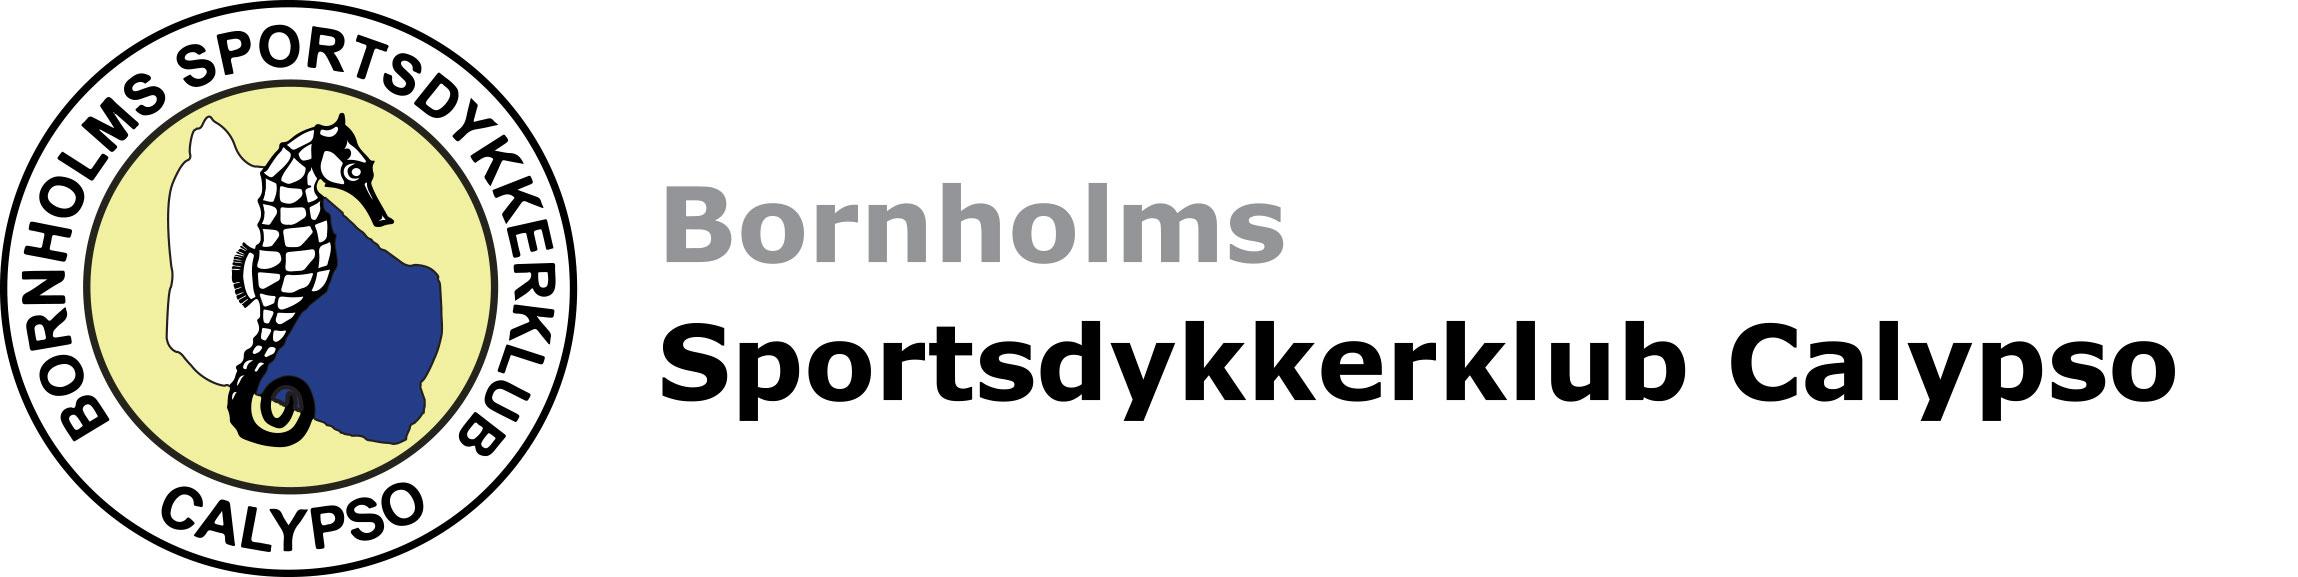 Bornholms Sportsdykkerklub Calypso